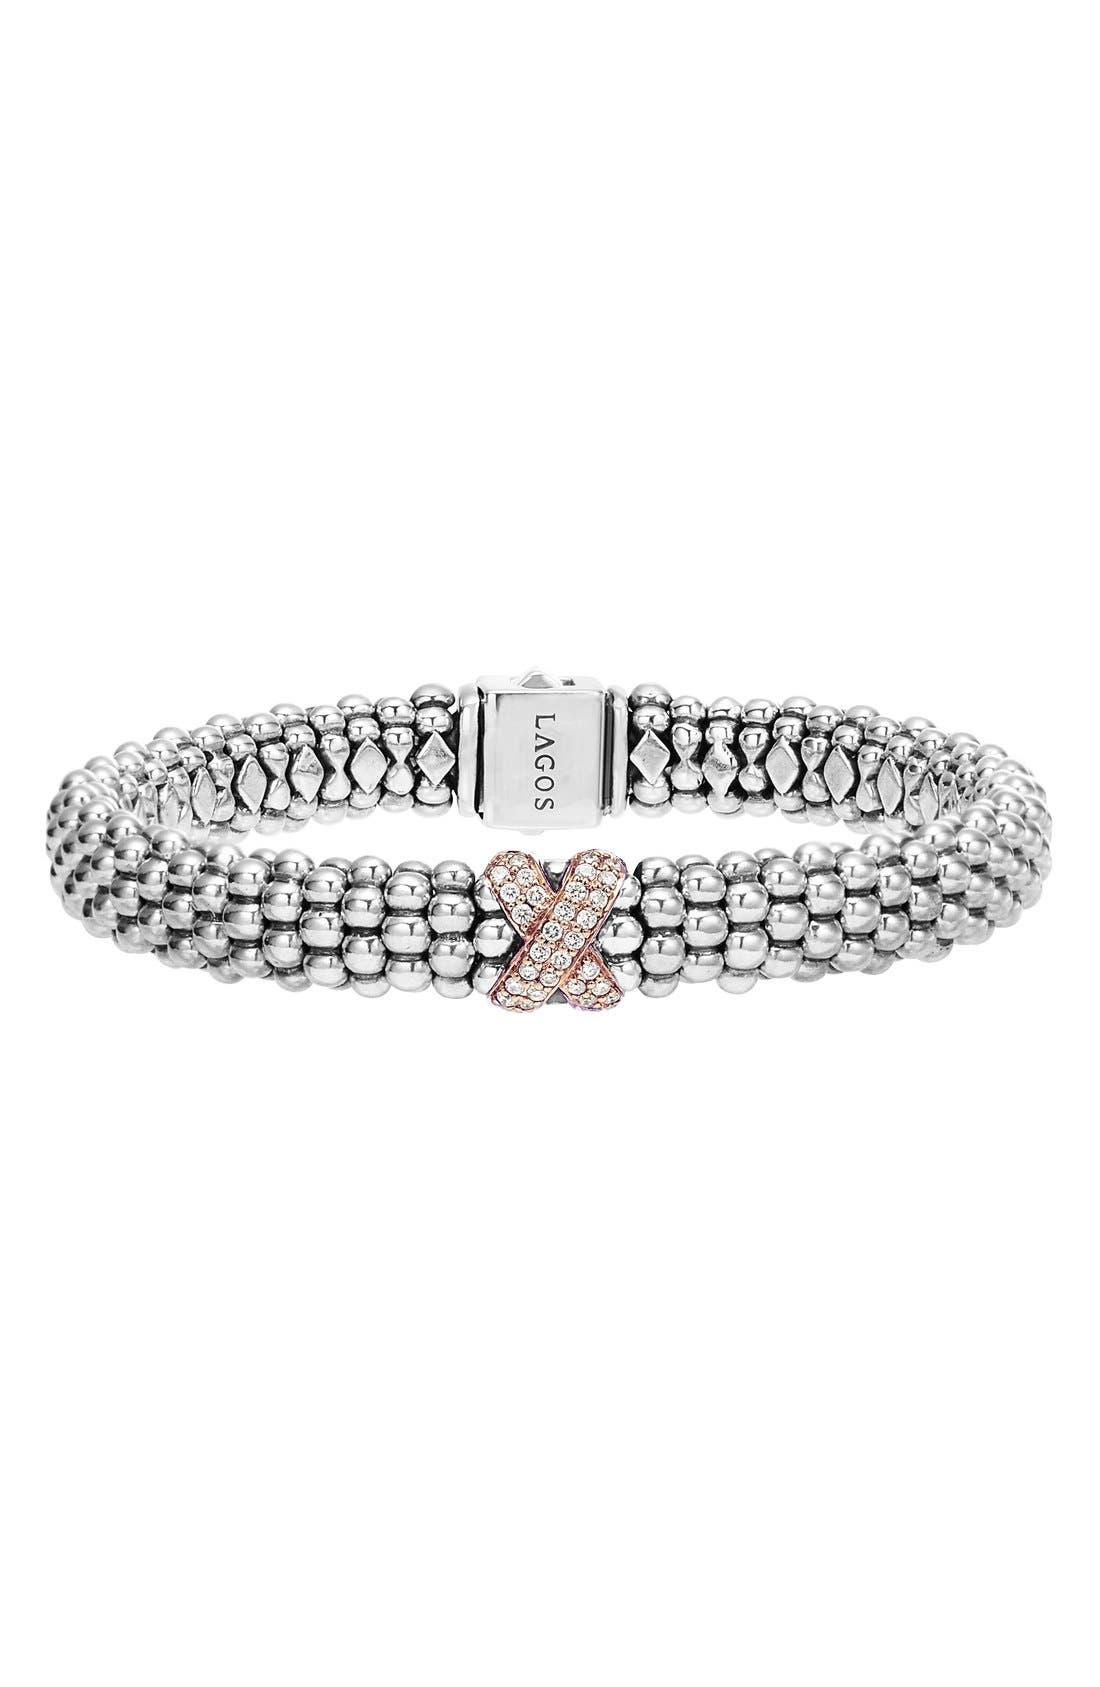 'Caviar' Gold Diamond Rope Bracelet,                             Main thumbnail 1, color,                             SILVER/ ROSE GOLD